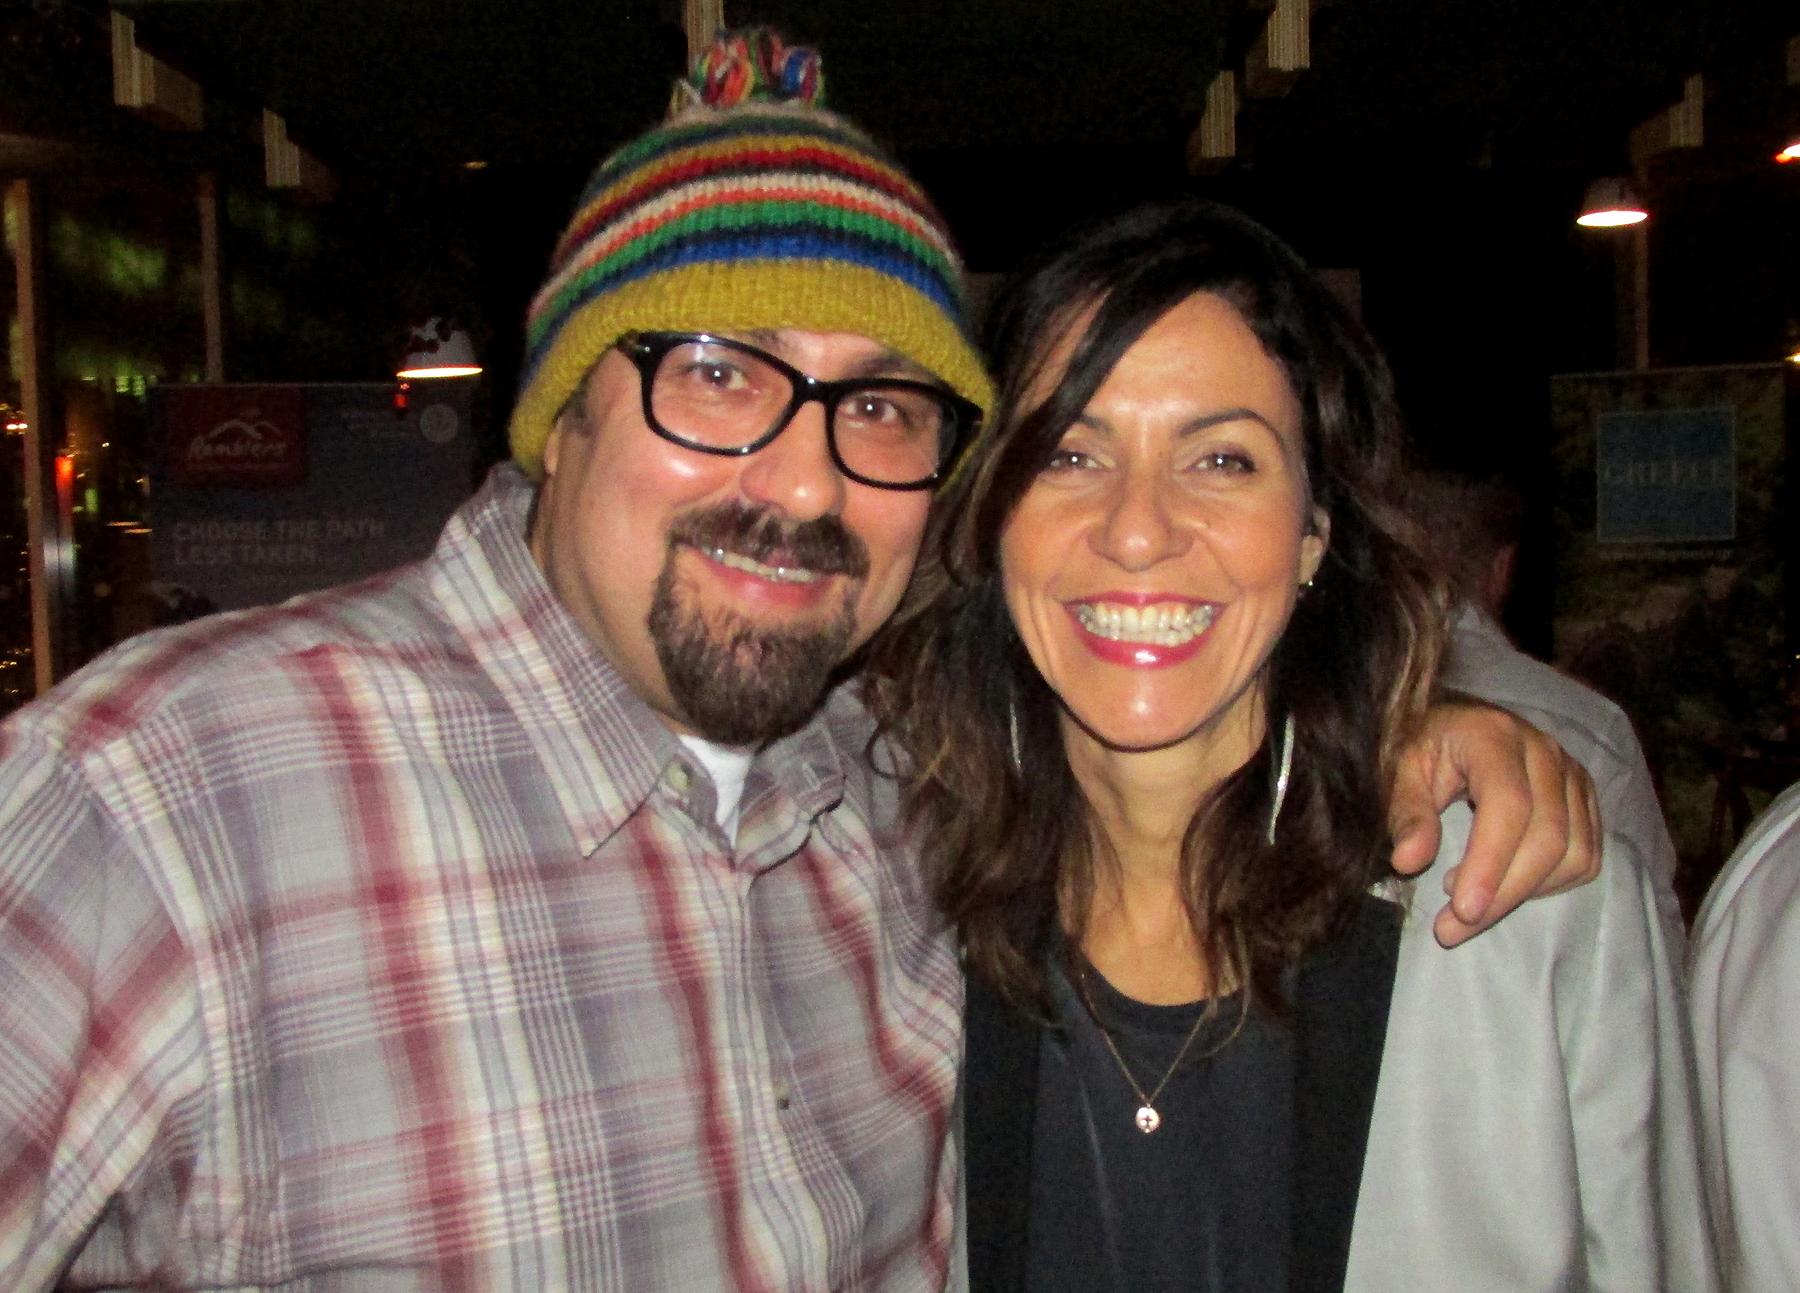 Julia Bradbury & Dave Sherwood